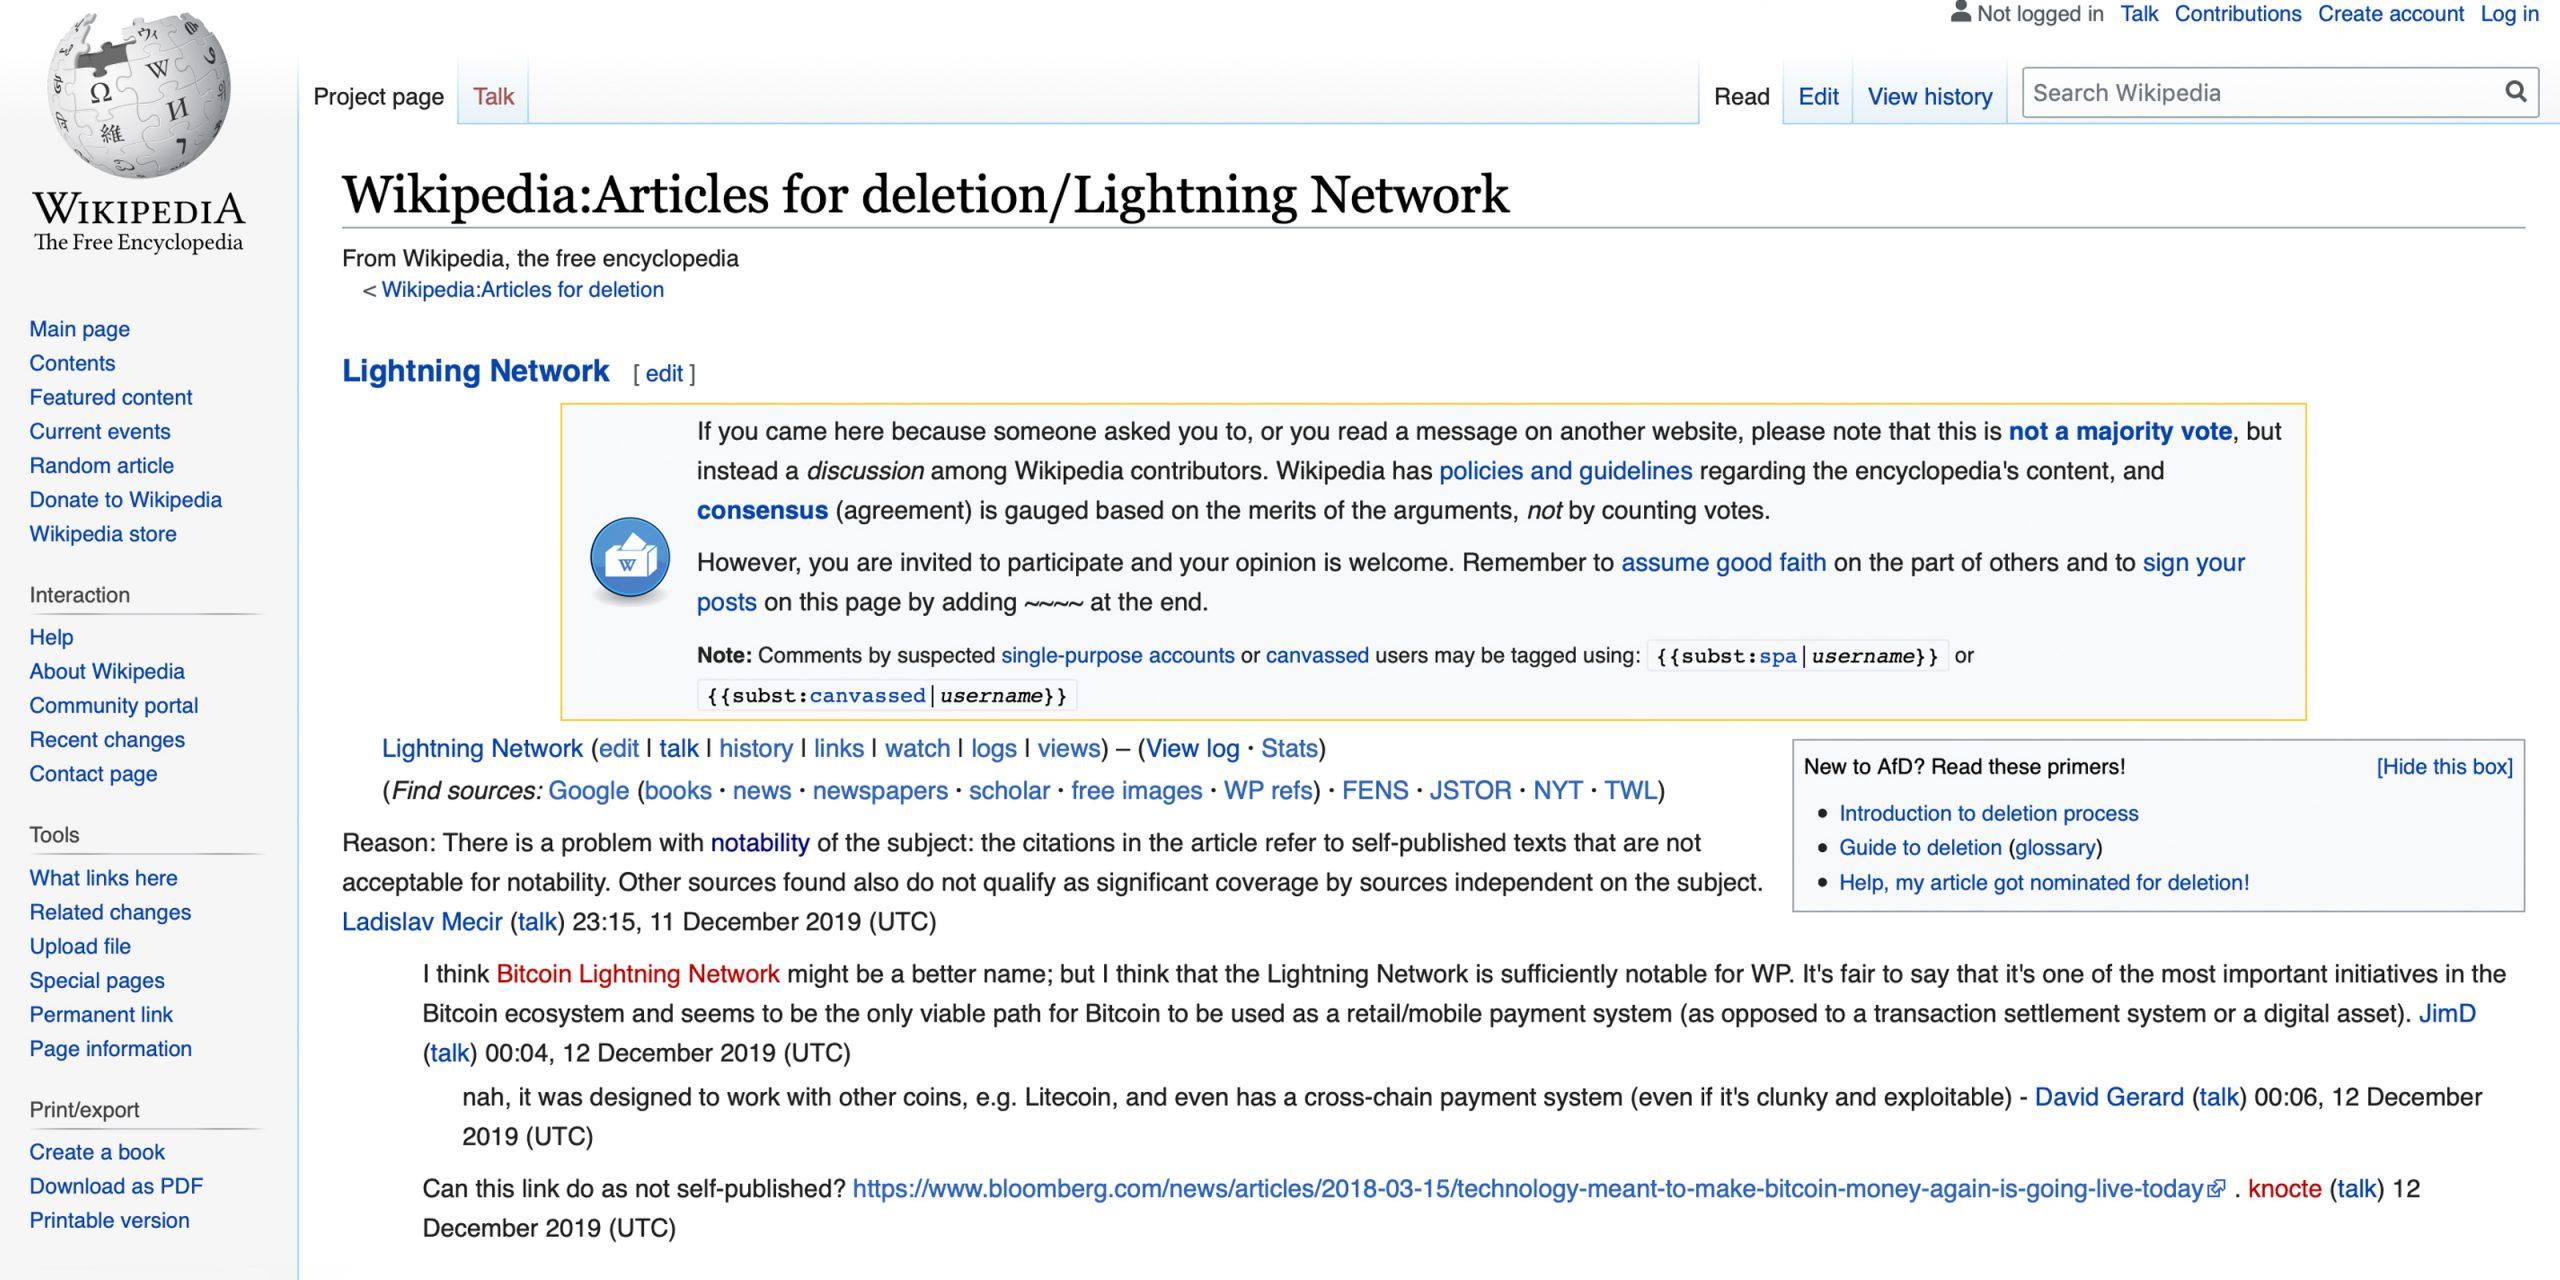 "La página Wiki de Lightning Network se enfrenta a la eliminación por falta de notoriedad ""width ="" 2560 ""height ="" 1280 ""srcset ="" https://blackswanfinances.com/wp-content/uploads/2019/12/wikiworld-scaled.jpg 2560w, https://news.bitcoin.com/wp-content/uploads/2019/12/wikiworld-300x150 .jpg 300w, https://news.bitcoin.com/wp-content/uploads/2019/12/wikiworld-1024x512.jpg 1024w, https://news.bitcoin.com/wp-content/uploads/2019/12 /wikiworld-768x384.jpg 768w, https://news.bitcoin.com/wp-content/uploads/2019/12/wikiworld-1536x768.jpg 1536w, https://news.bitcoin.com/wp-content/uploads /2019/12/wikiworld-2048x1024.jpg 2048w, https://news.bitcoin.com/wp-content/uploads/2019/12/wikiworld-696x348.jpg 696w, https://news.bitcoin.com/wp -content / uploads / 2019/12 / wikiworld-1392x696.jpg 1392w, https://news.bitcoin.com/wp-content/uploads/2019/12/wikiworld-1068x534.jpg 1068w, https: //news.bitcoin .com / wp-content / uploads / 2019/12 / w ikiworld-840x420.jpg 840w, https://news.bitcoin.com/wp-content/uploads/2019/12/wikiworld-1920x960.jpg 1920w ""tamaños ="" (ancho máximo: 2560px) 100vw, 2560px"